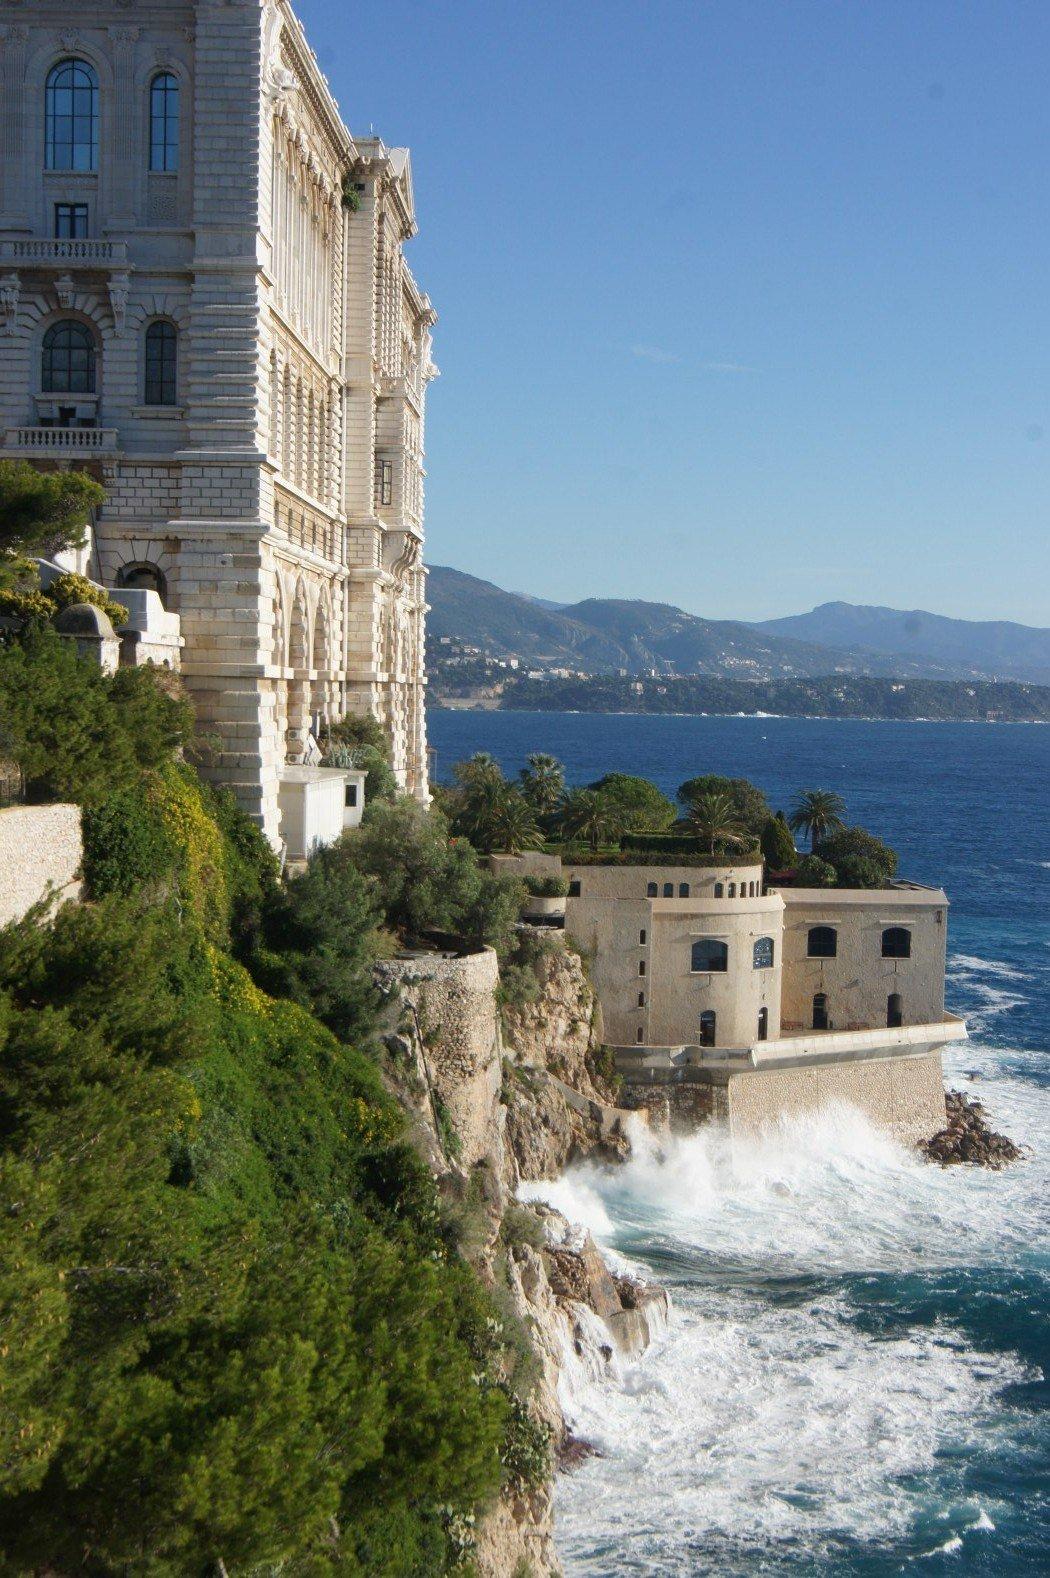 Prince Palace, Monaco